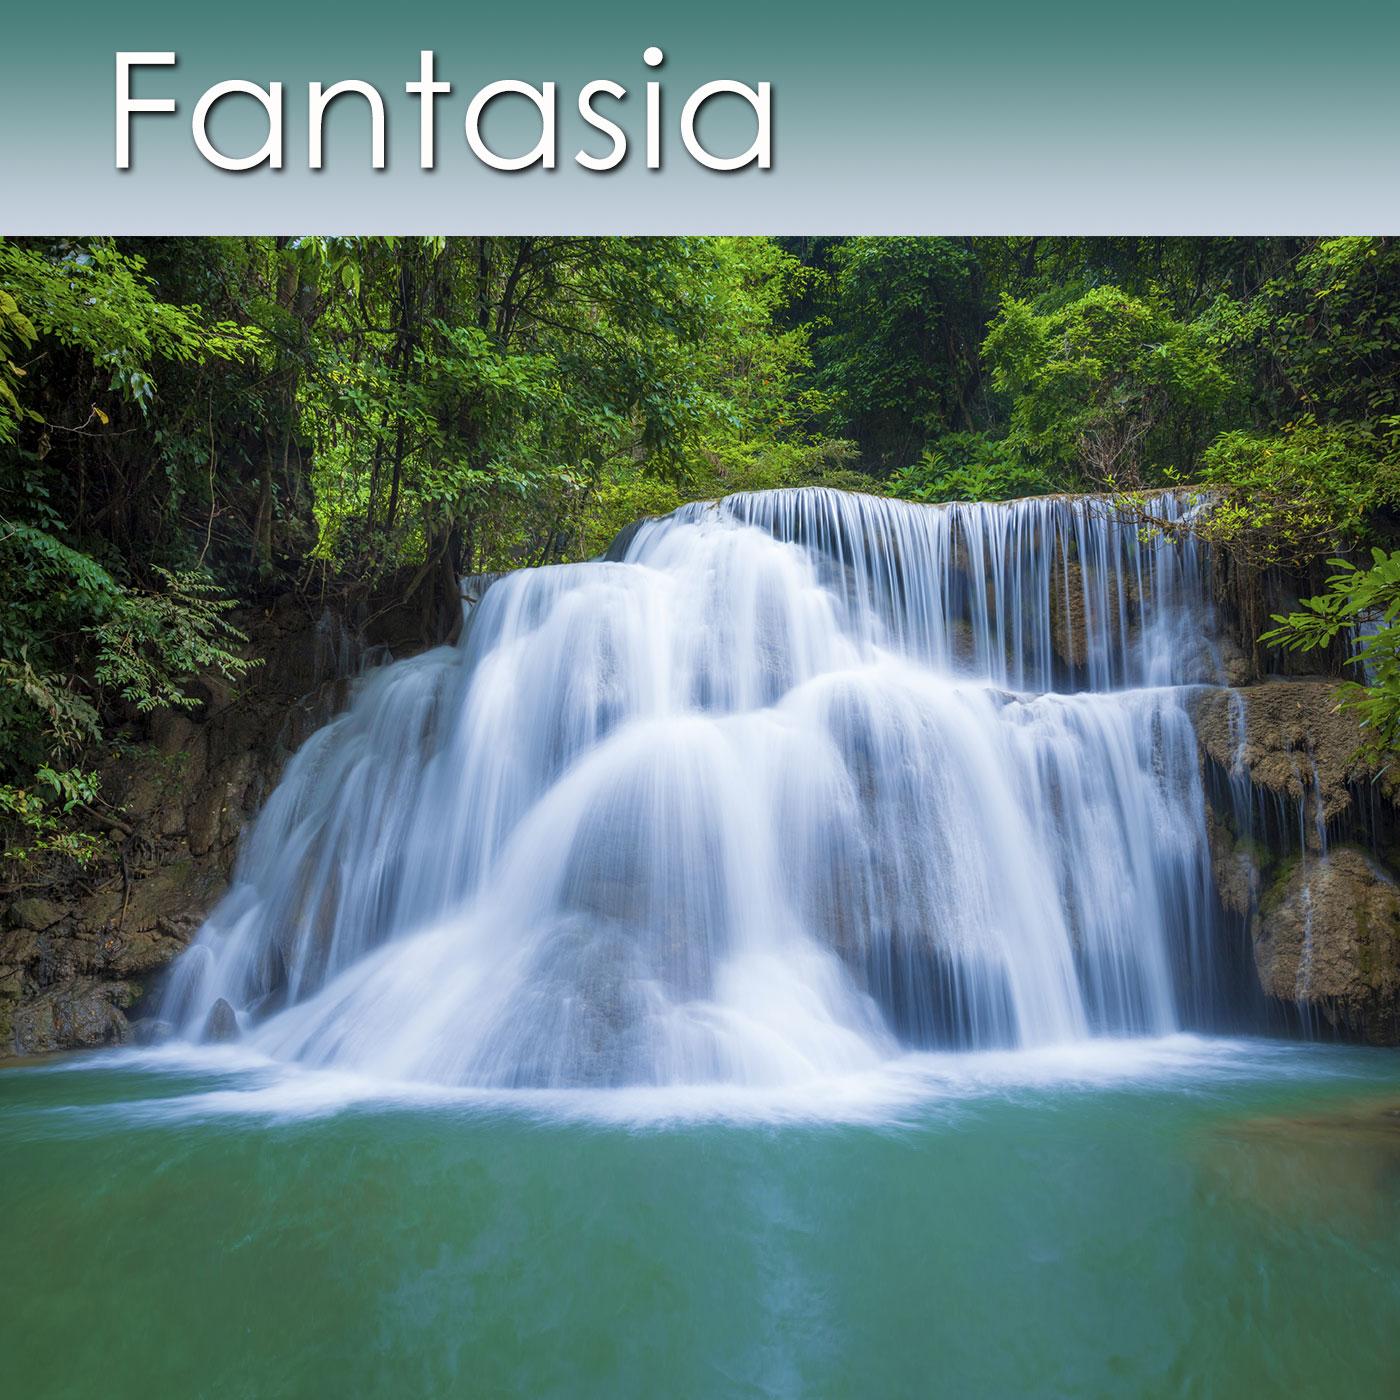 Fantasia.jpg